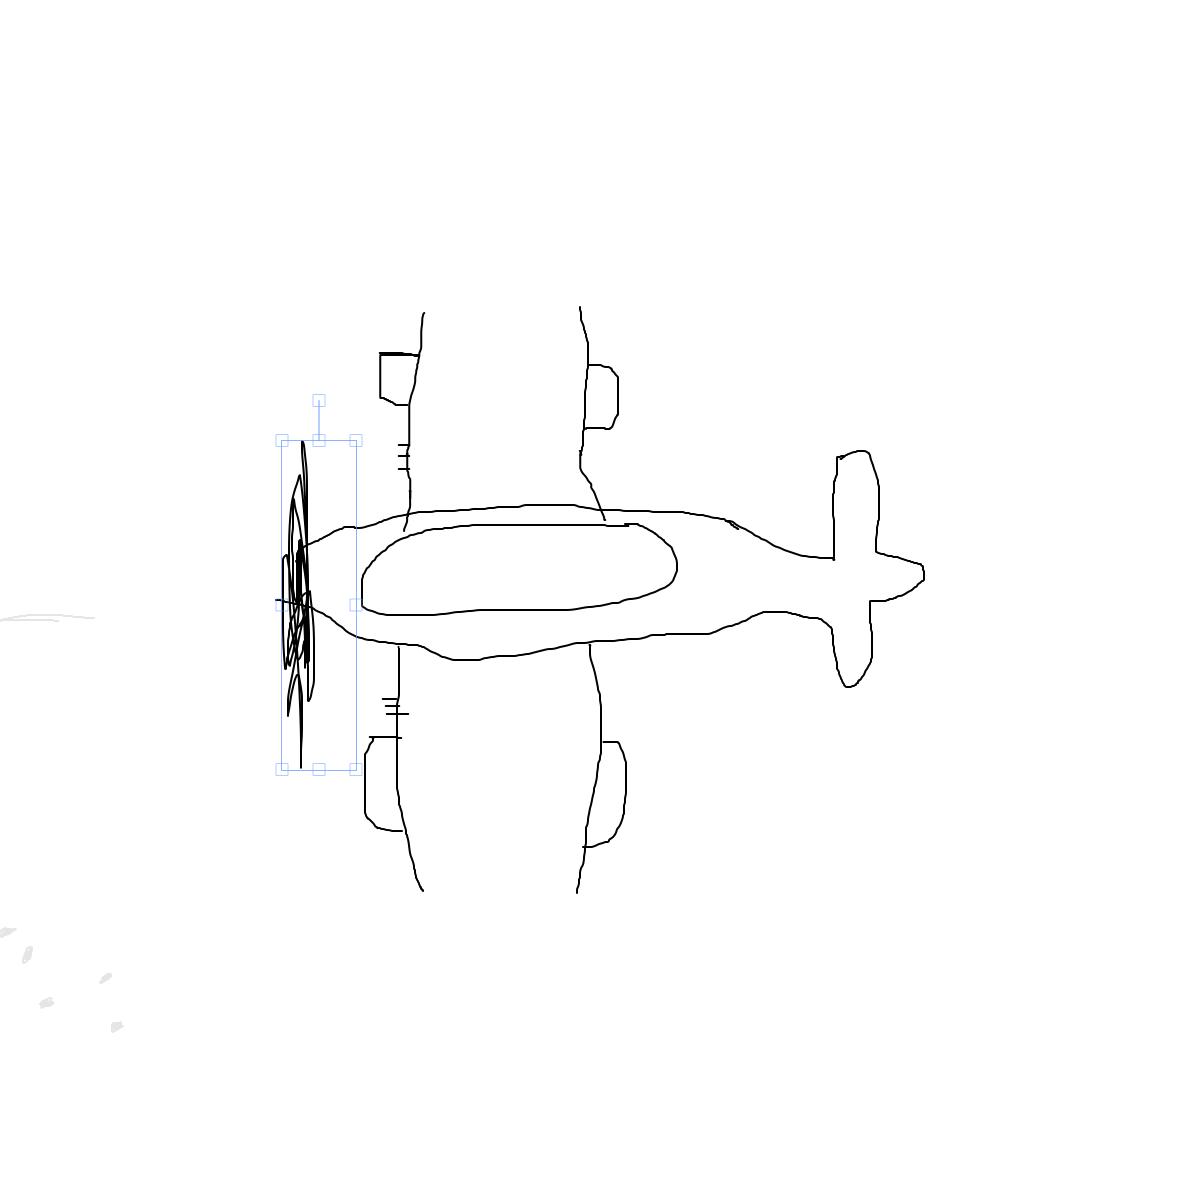 BAAAM drawing#6679 lat:76.5737457275390600lng: 16.3237476348876950